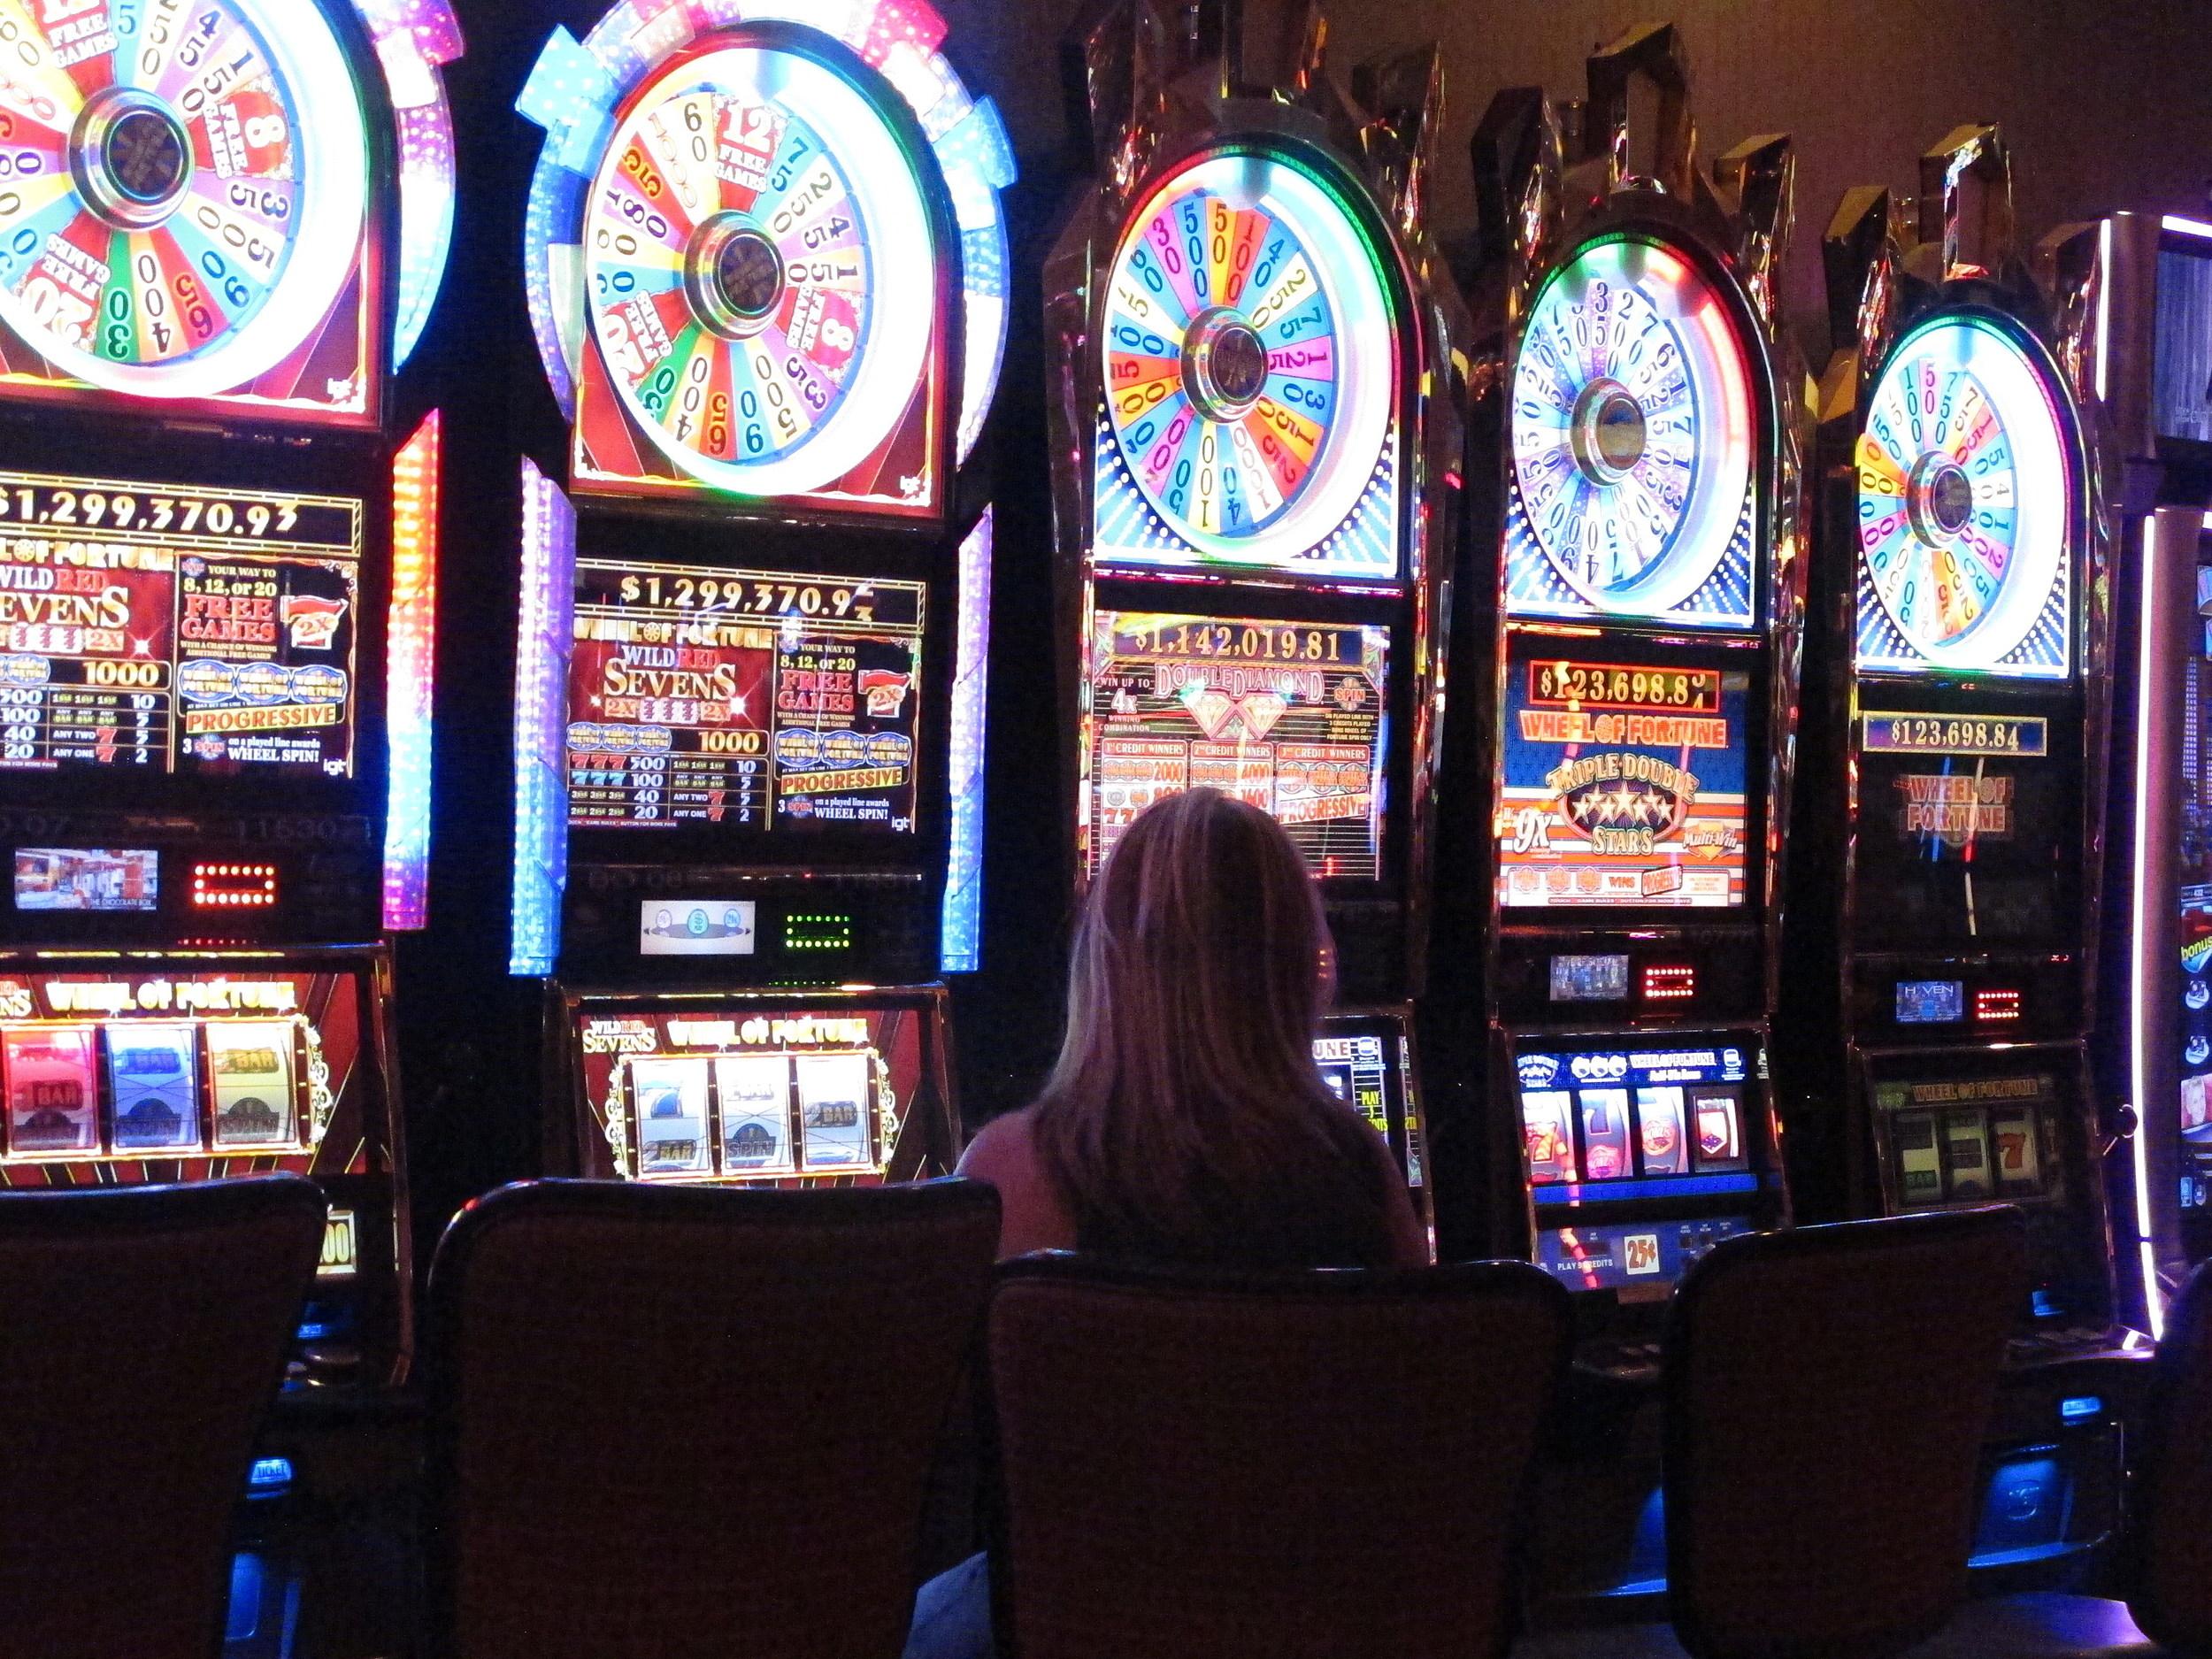 Types of slot machines in atlantic city casino sault ste marie on